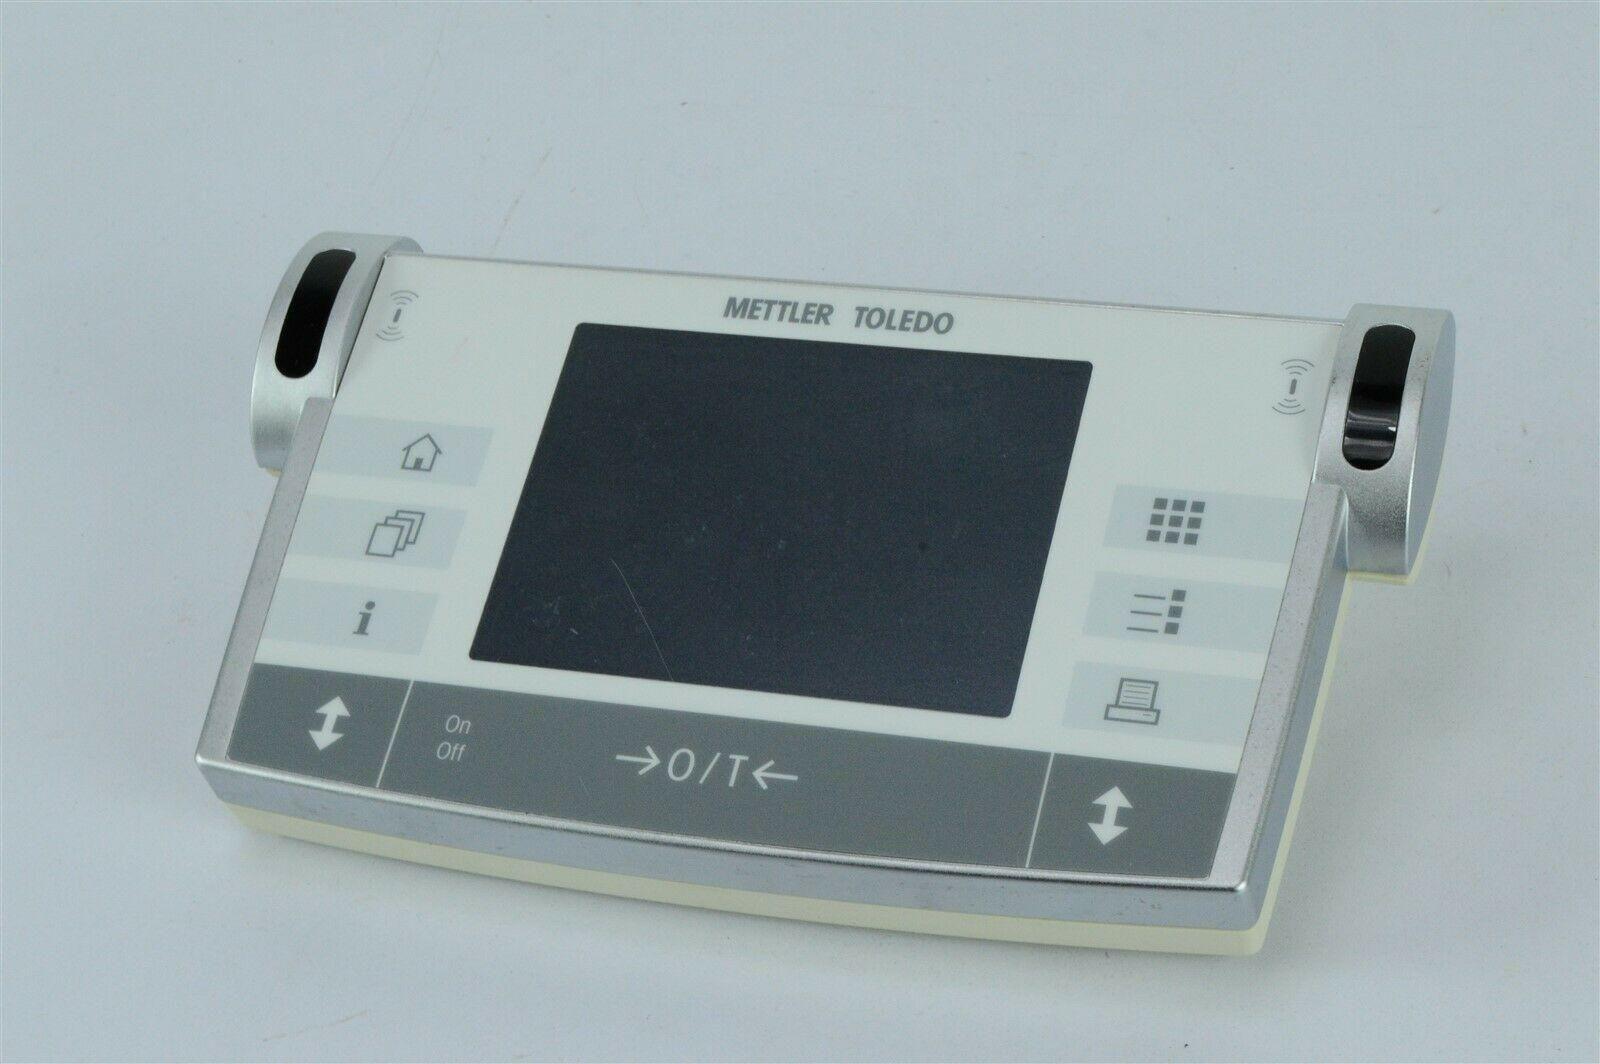 Mettler Toledo AX Analytical Balance Control Keypad Screen AX203/204/205 AX26